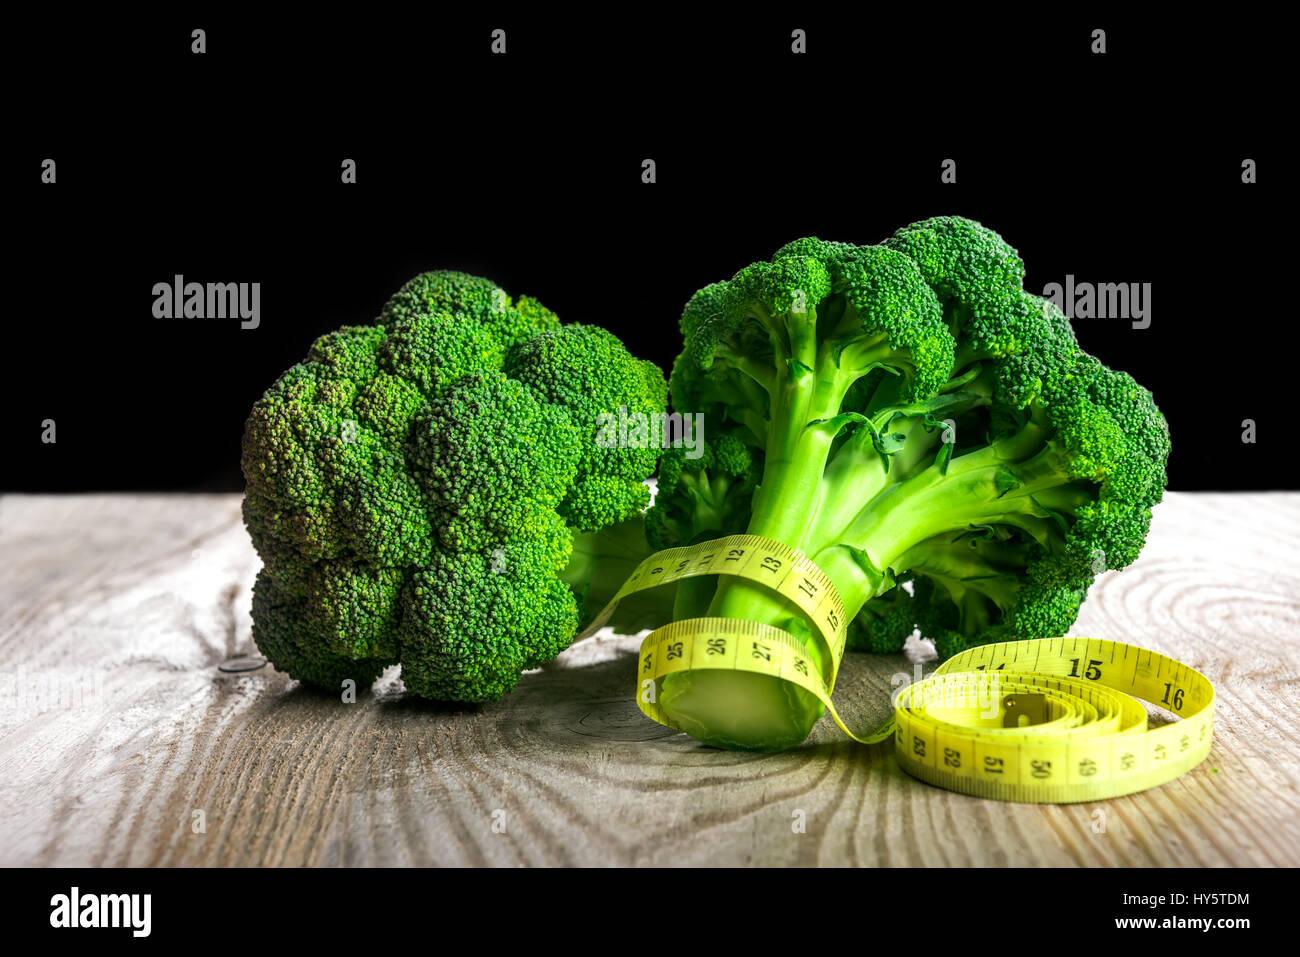 Gemüse-Diät zur Gewichtsabnahme Stockbild